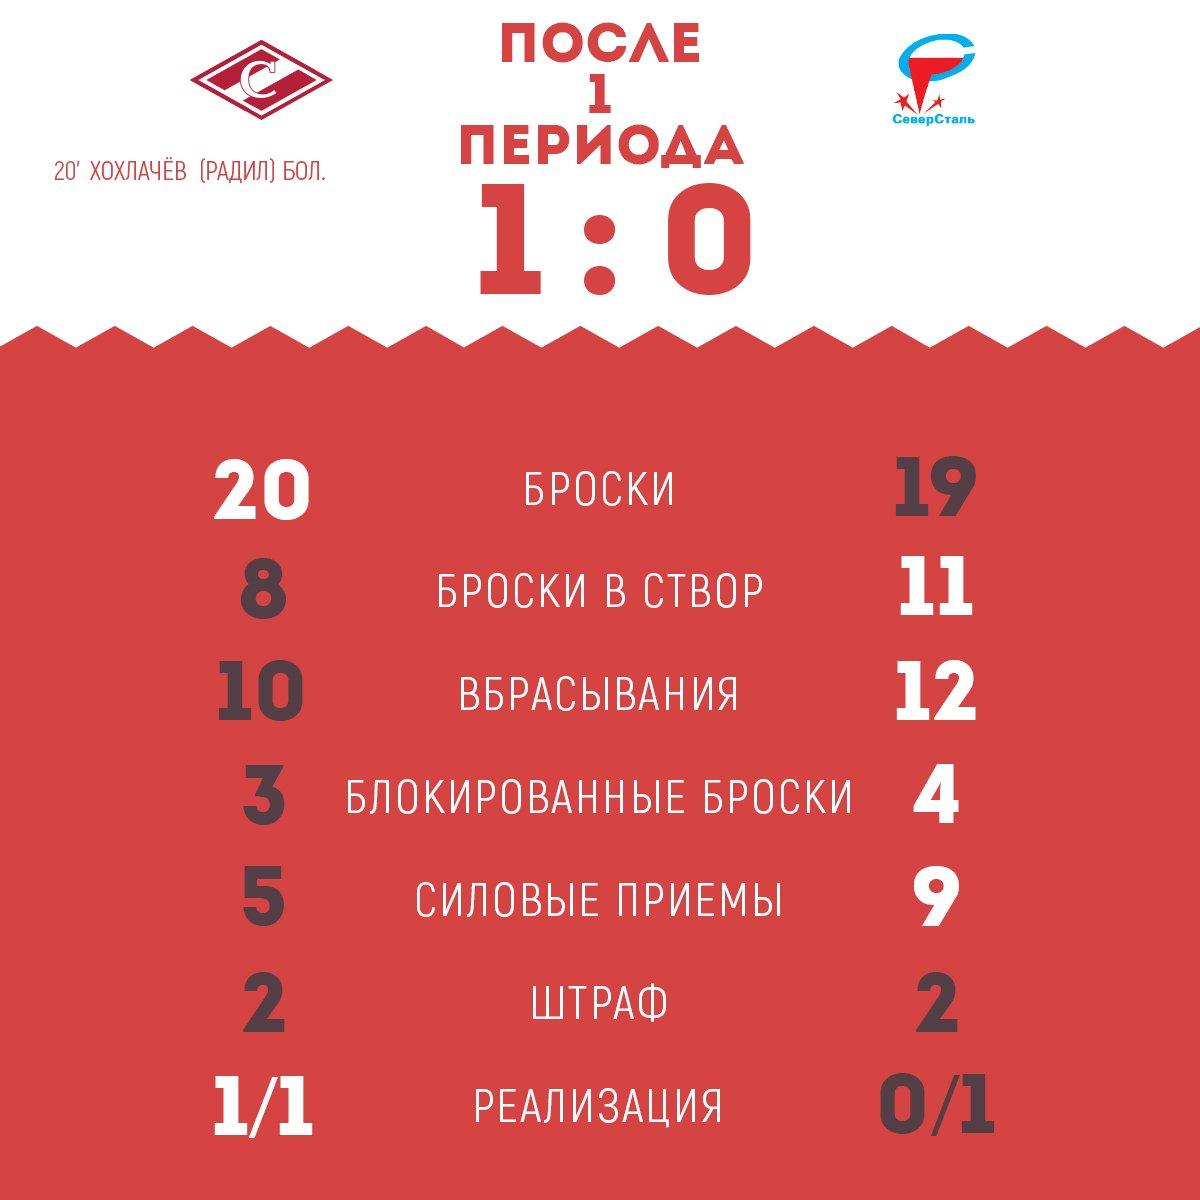 Статистика матча «Спартак» vs «Северсталь» после 1-го периода